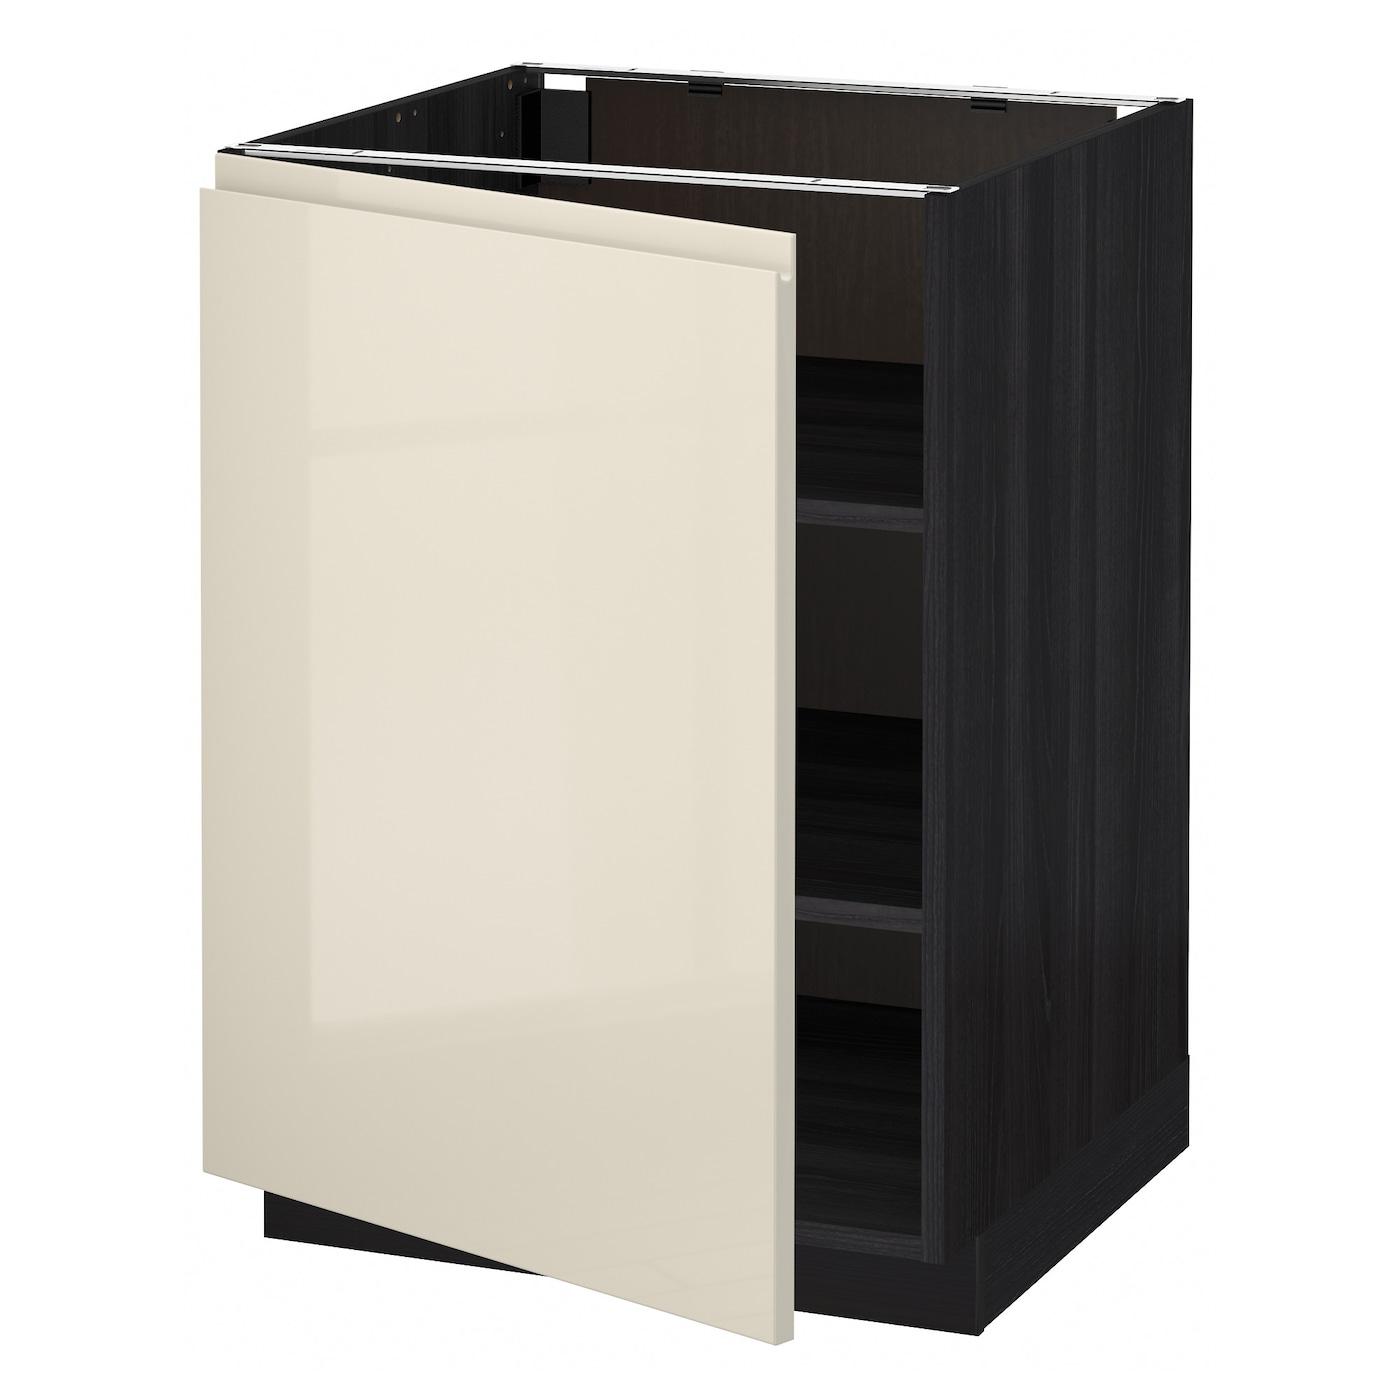 Metod Base Cabinet For Sink Black Järsta Orange 60x60 Cm: METOD Base Cabinet With Shelves Black/voxtorp High-gloss